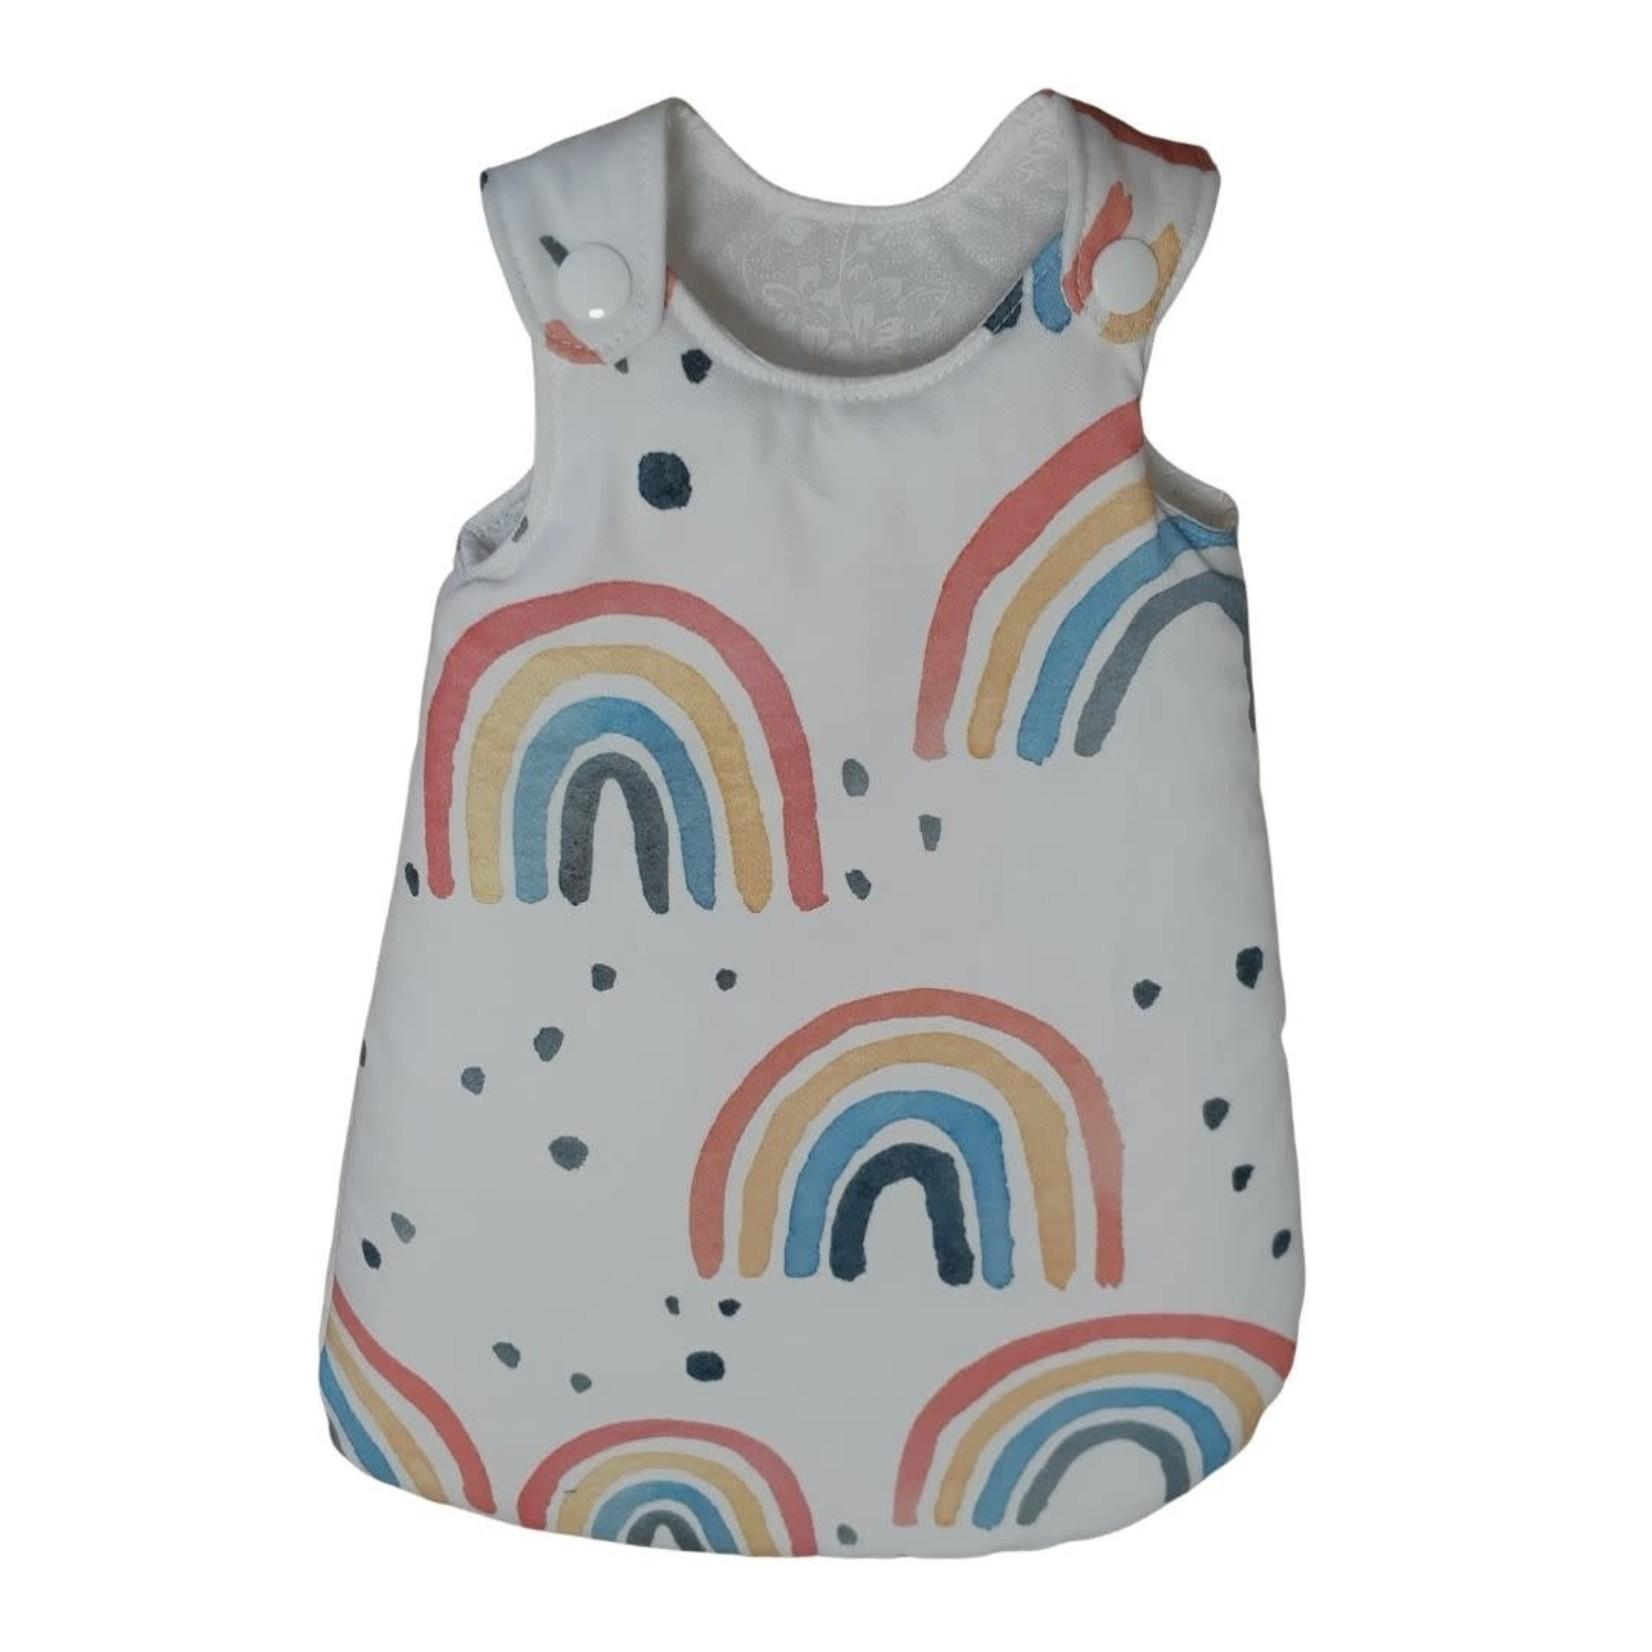 Wacky Wardrobe Wacky Wardrobe 38cm Doll Sleeping Bag Rainbow